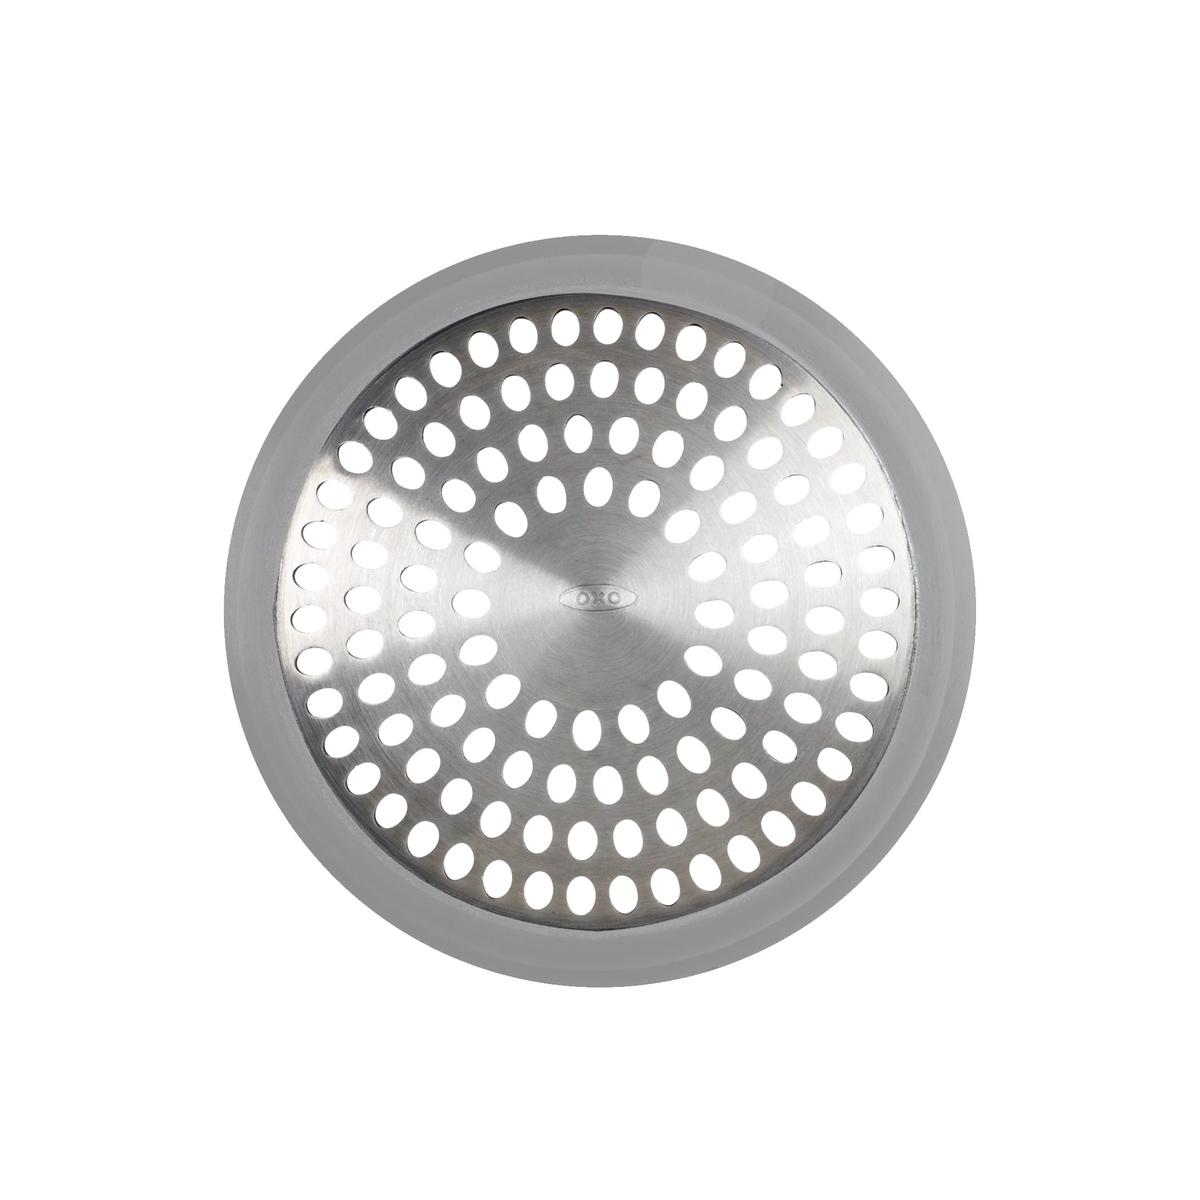 Онлайн каталог PROMENU: Протектор для ванны OXO BATH, 1х11х8 см, серебристый OXO 1395500